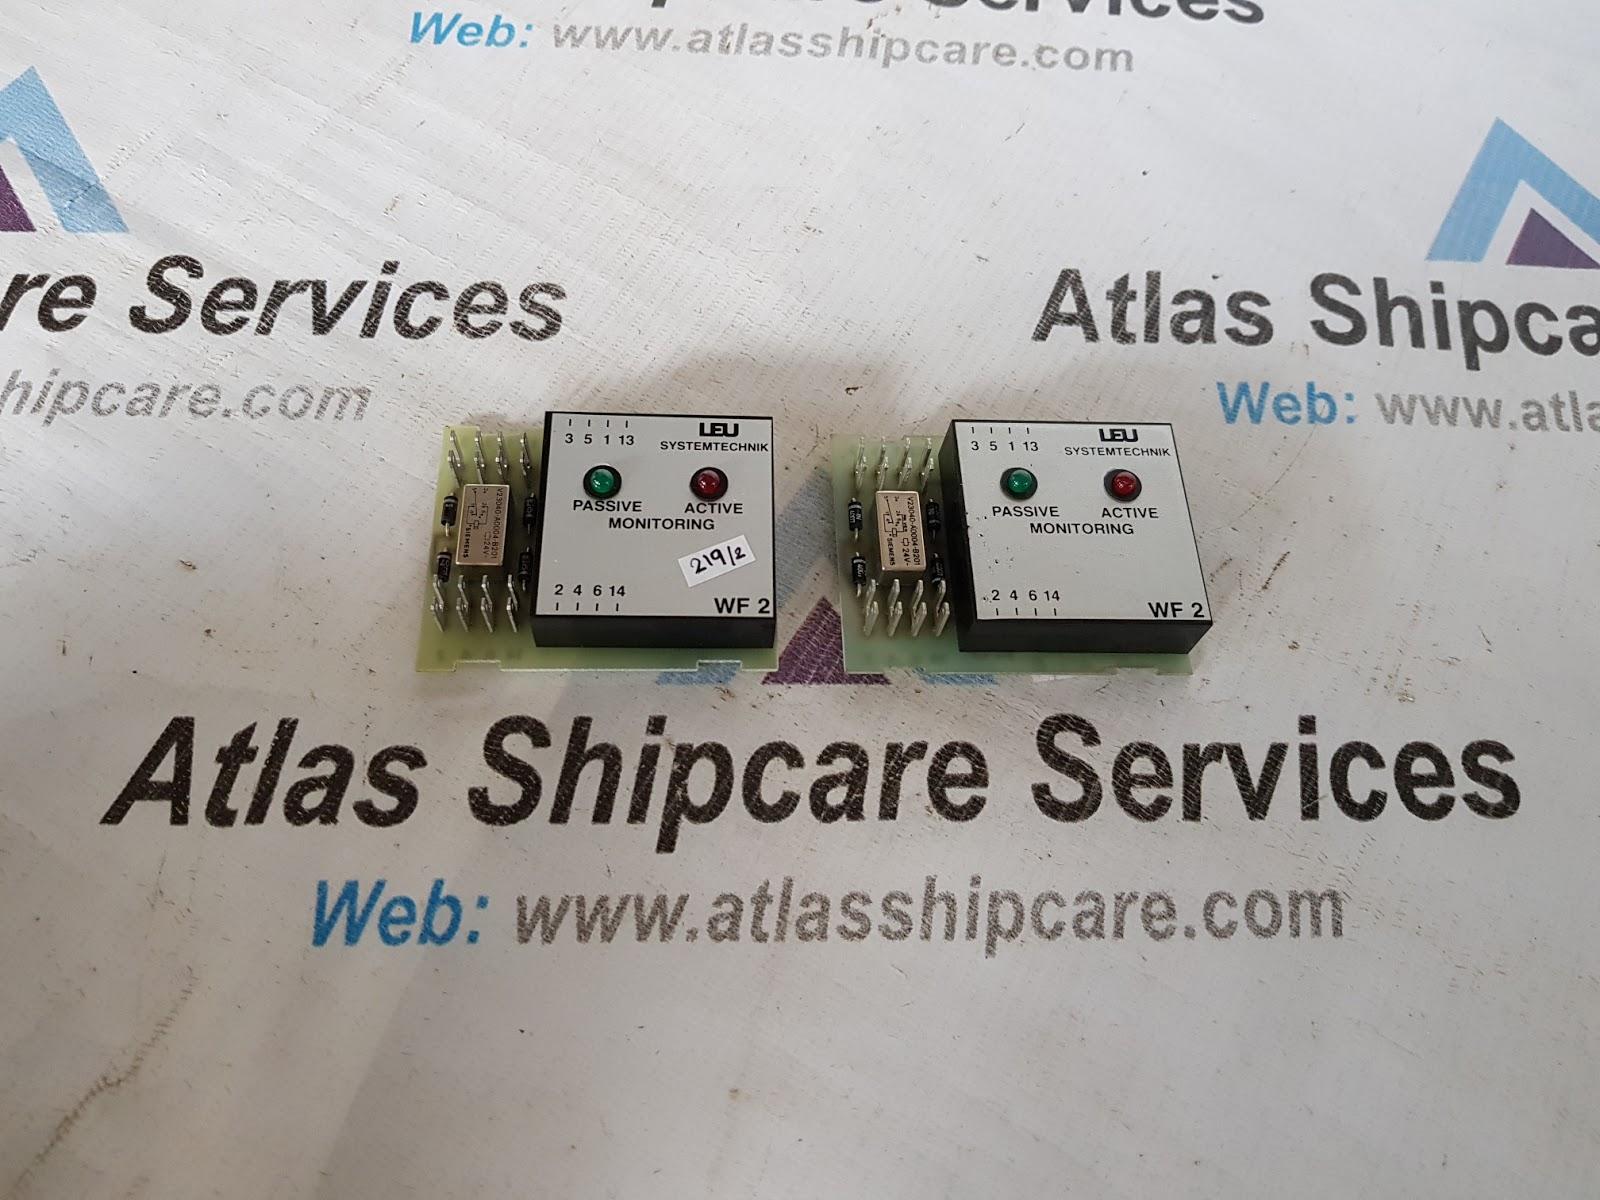 LEU SYSTEMTECHNIK LSP WF 2-S MONITORING   Atlas Shipcare Services